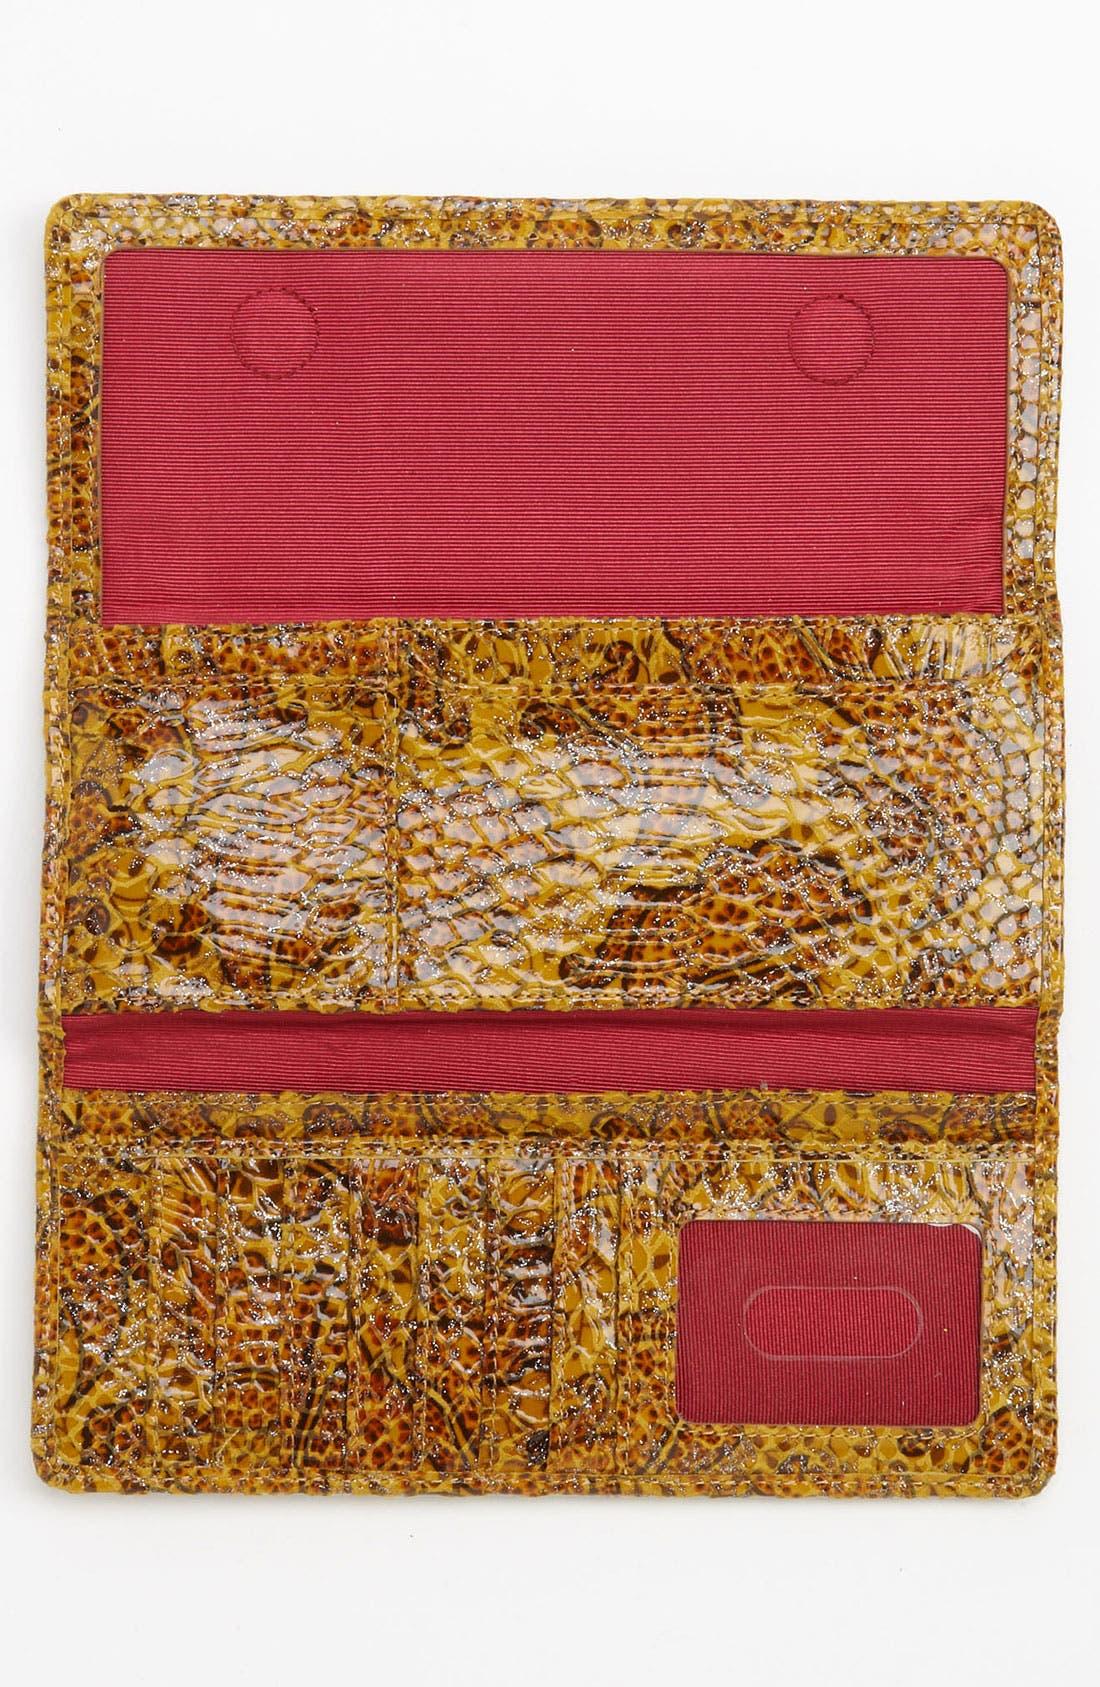 'Sadie' Leather Wallet,                             Alternate thumbnail 120, color,